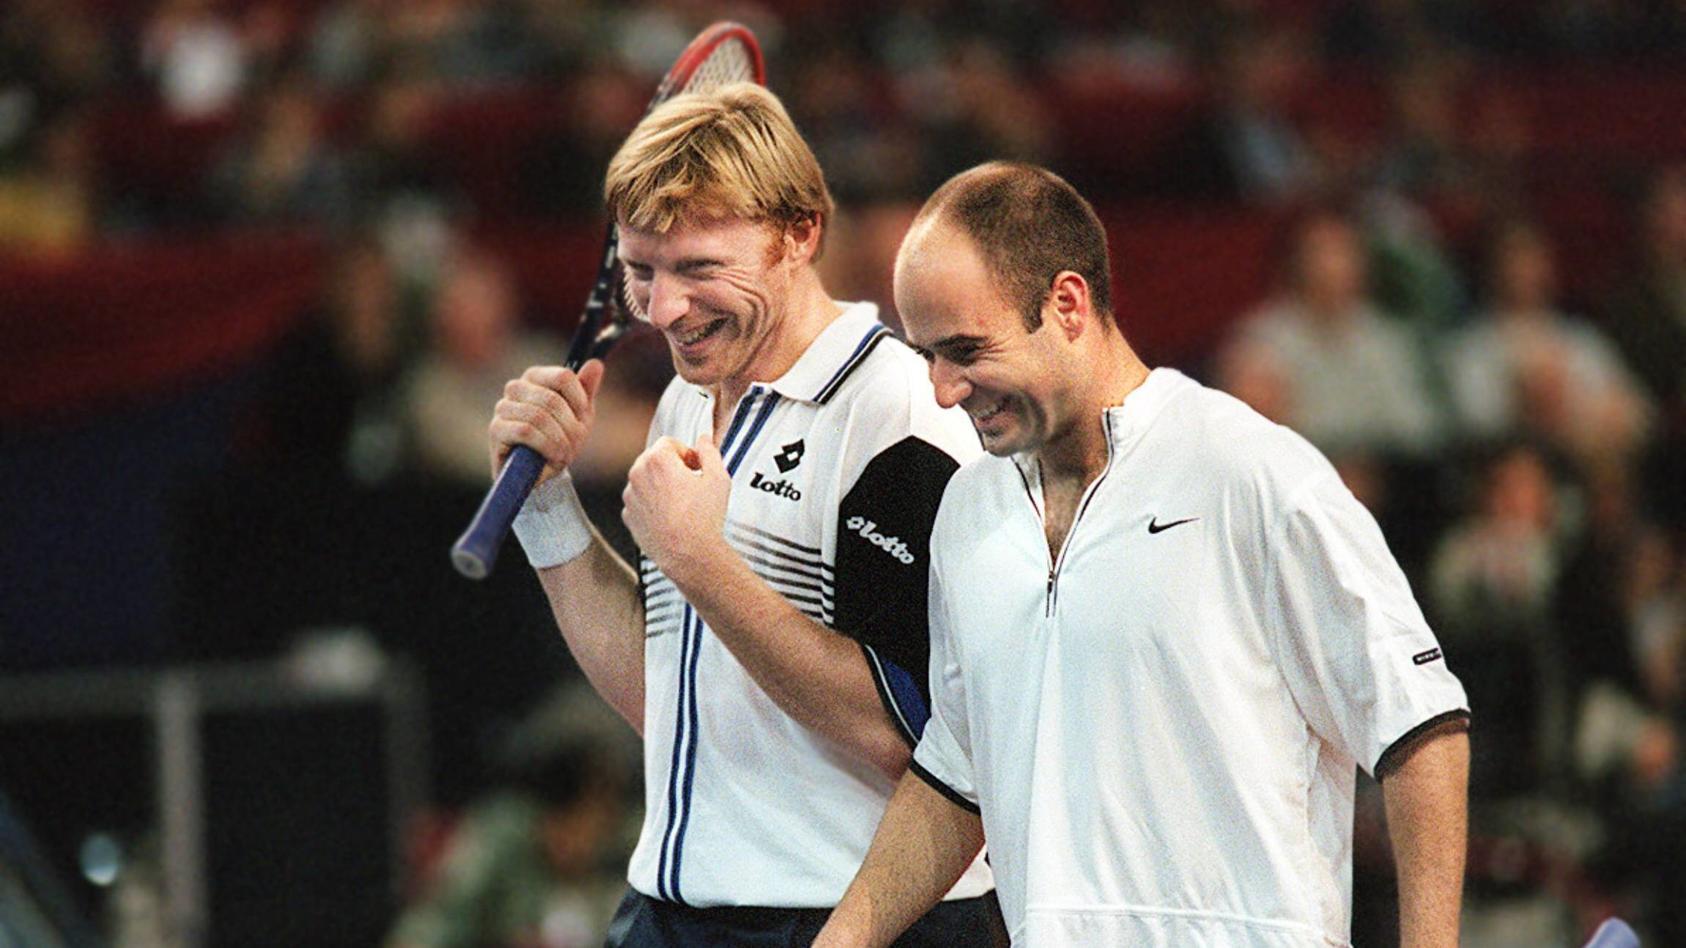 Boris Becker (l.) und Andre Agassi